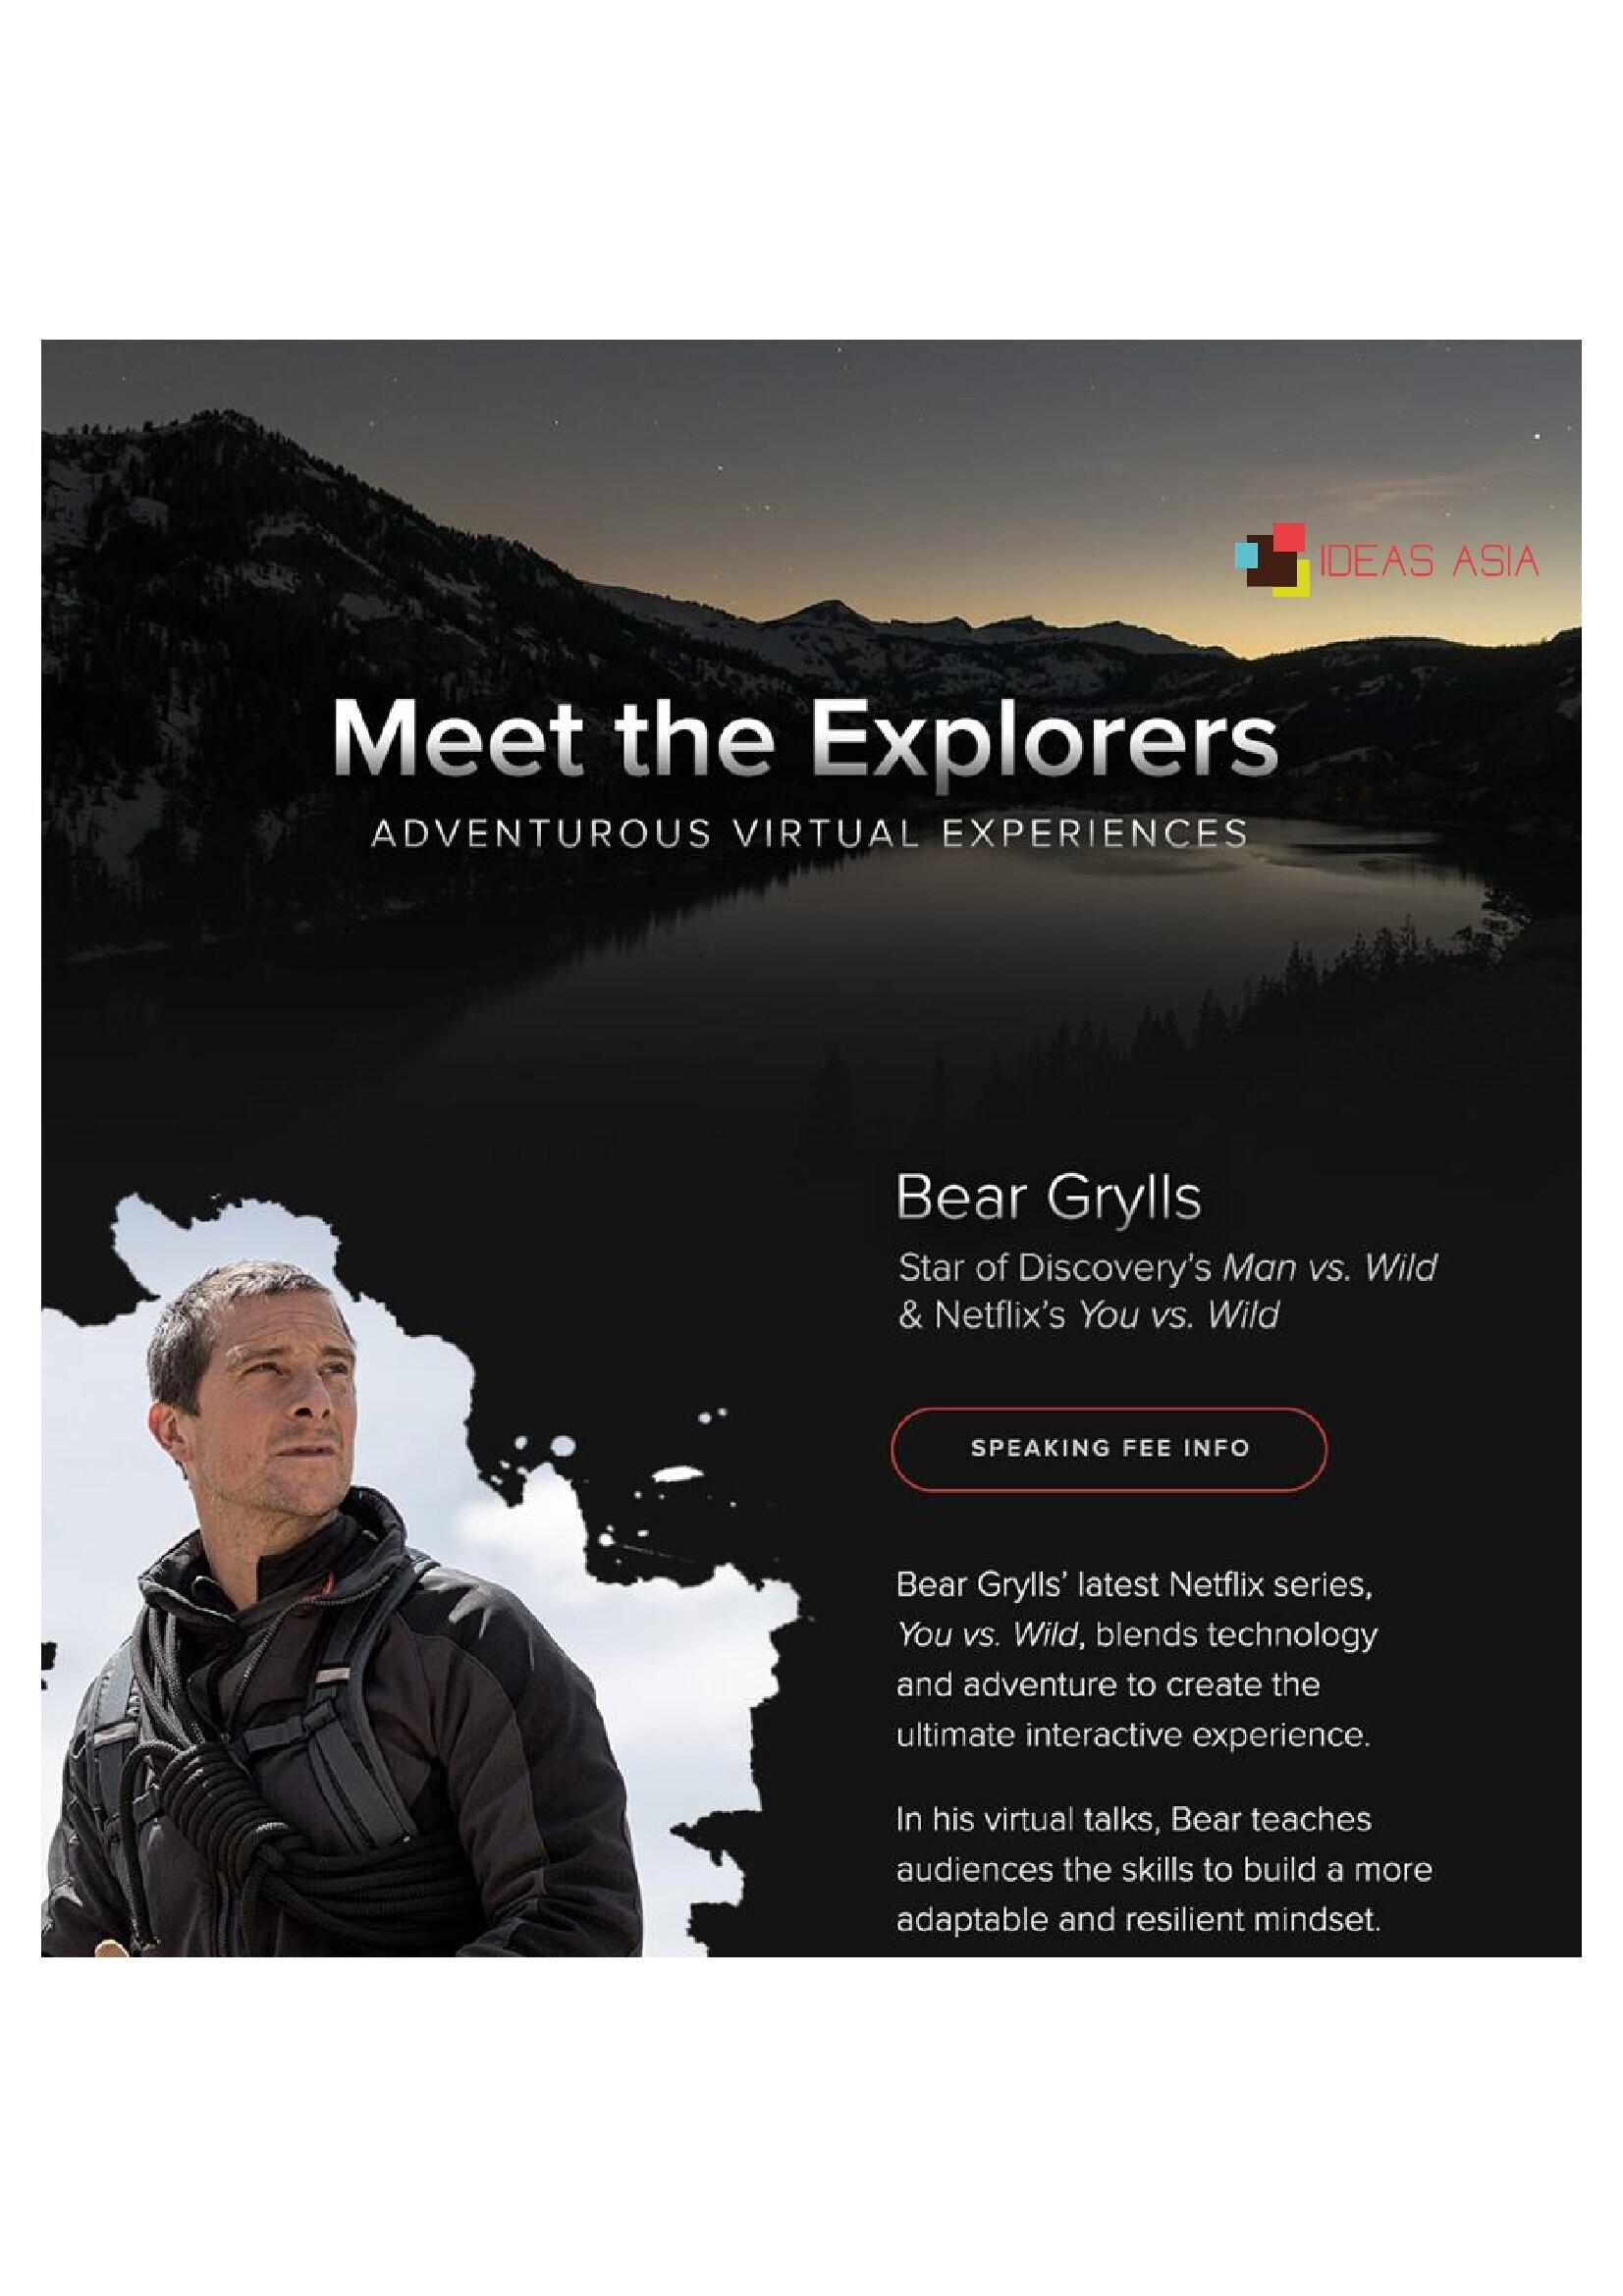 Bear Grylls - IDEAS ASIA Speakers Bureau